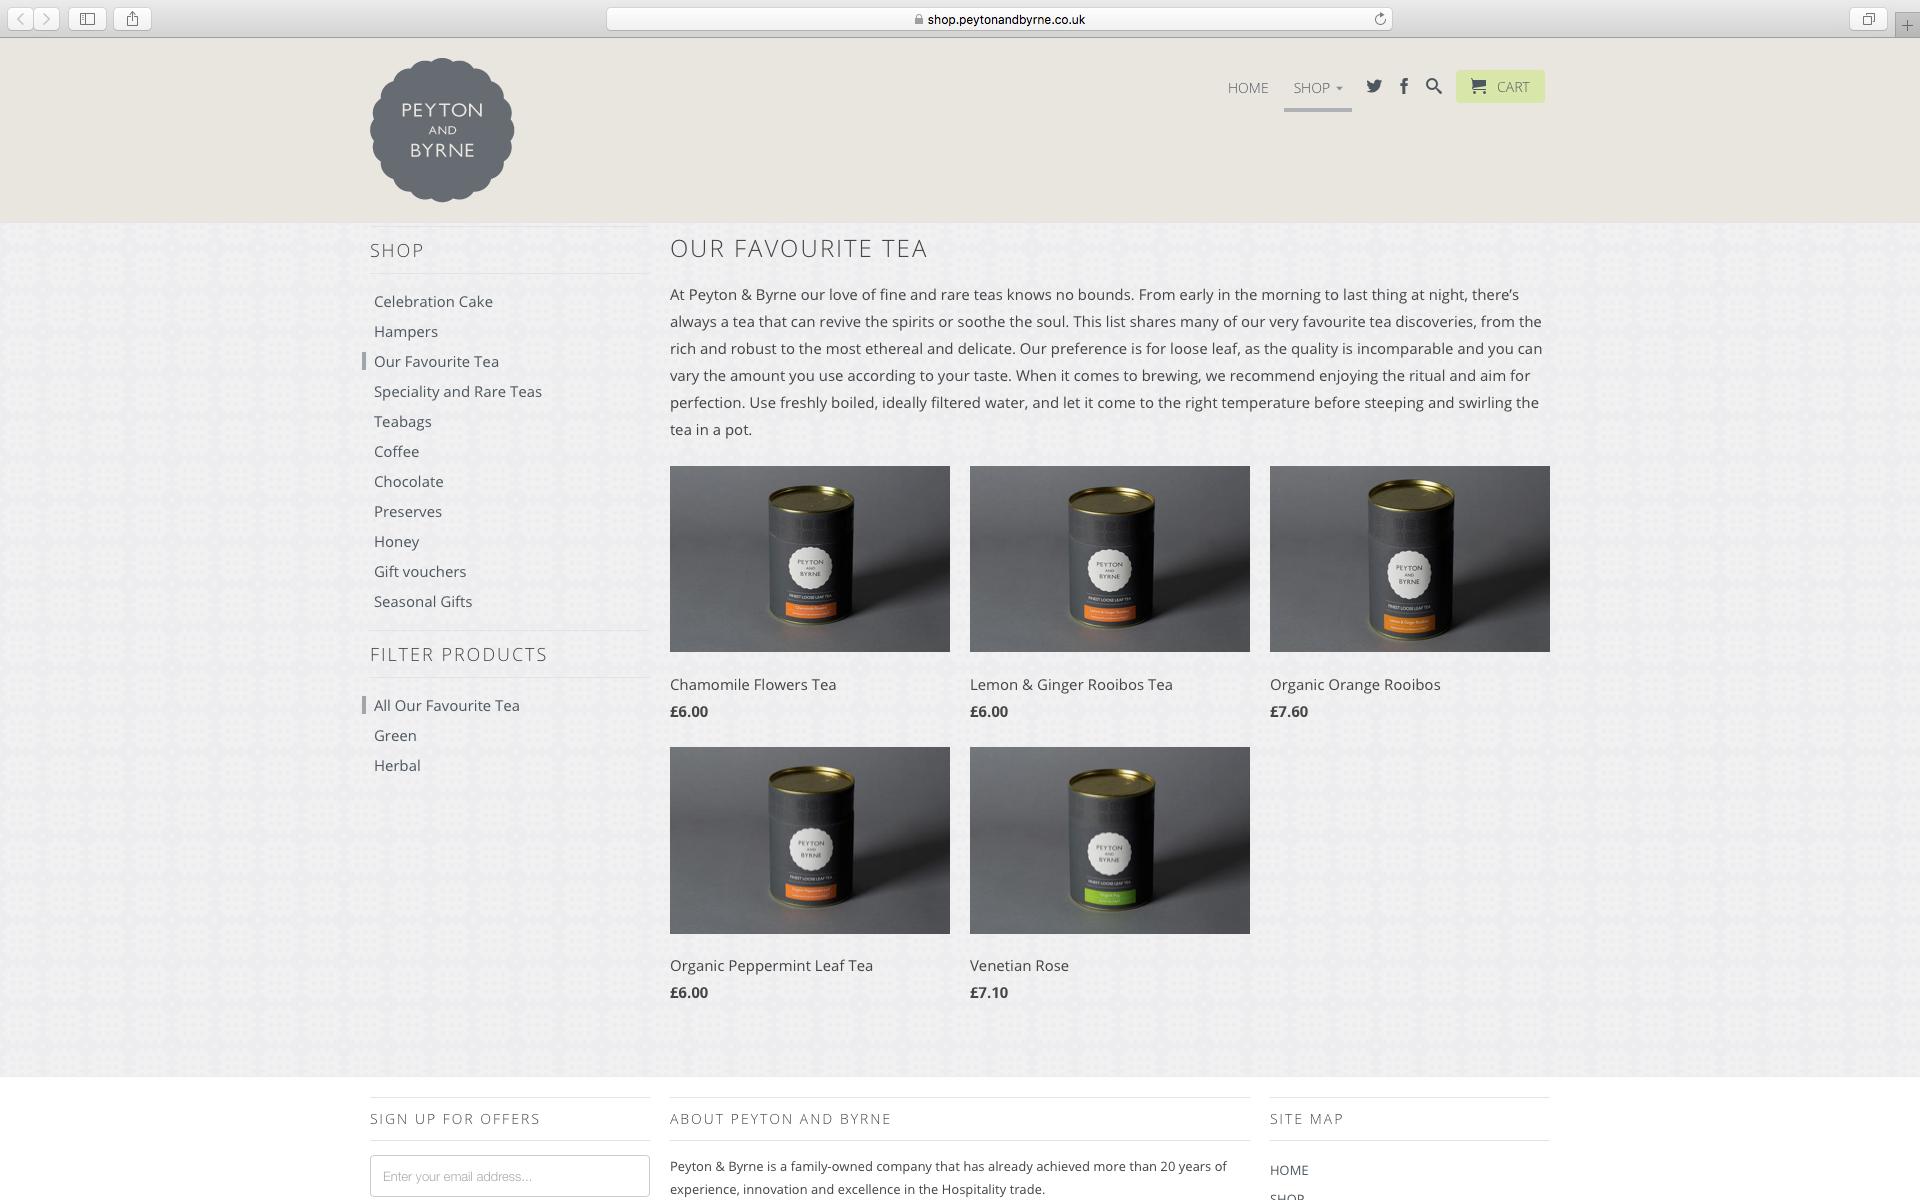 Loose leaf tea packaging for Peyton & Byrne